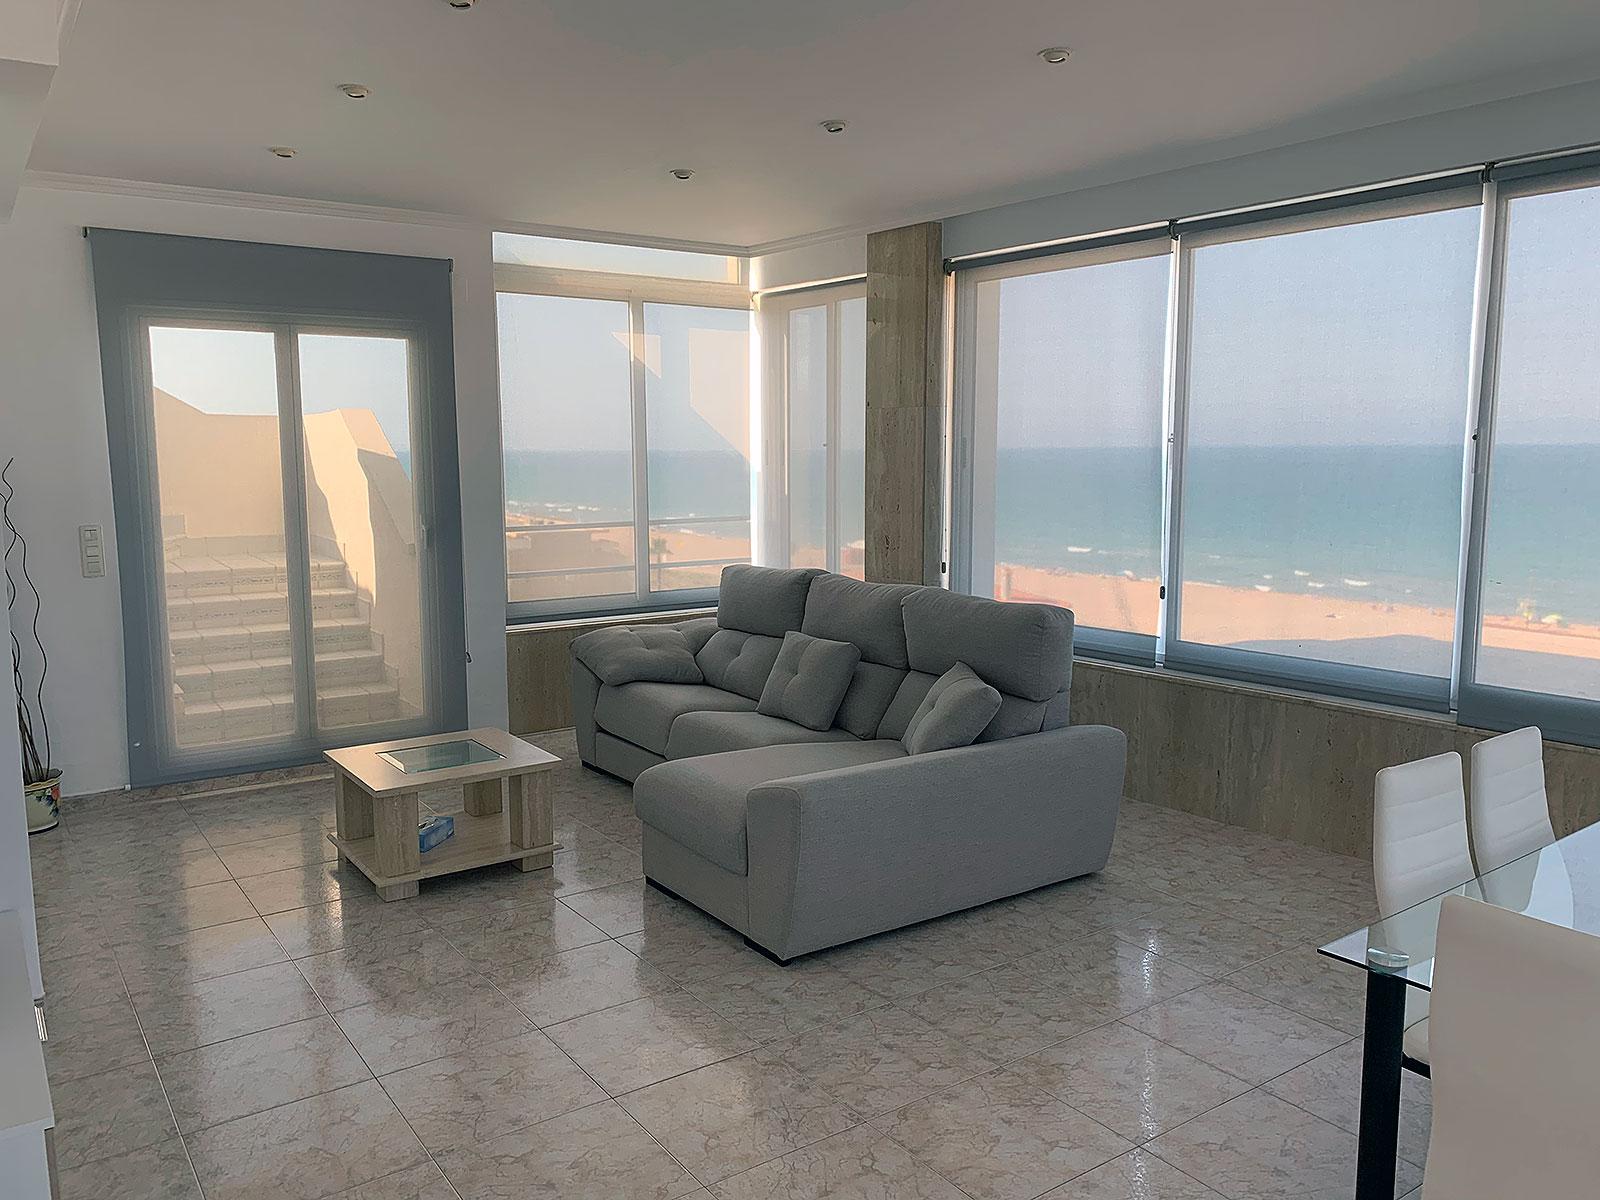 Apartamento en Playa de Xeraco (Valencia)